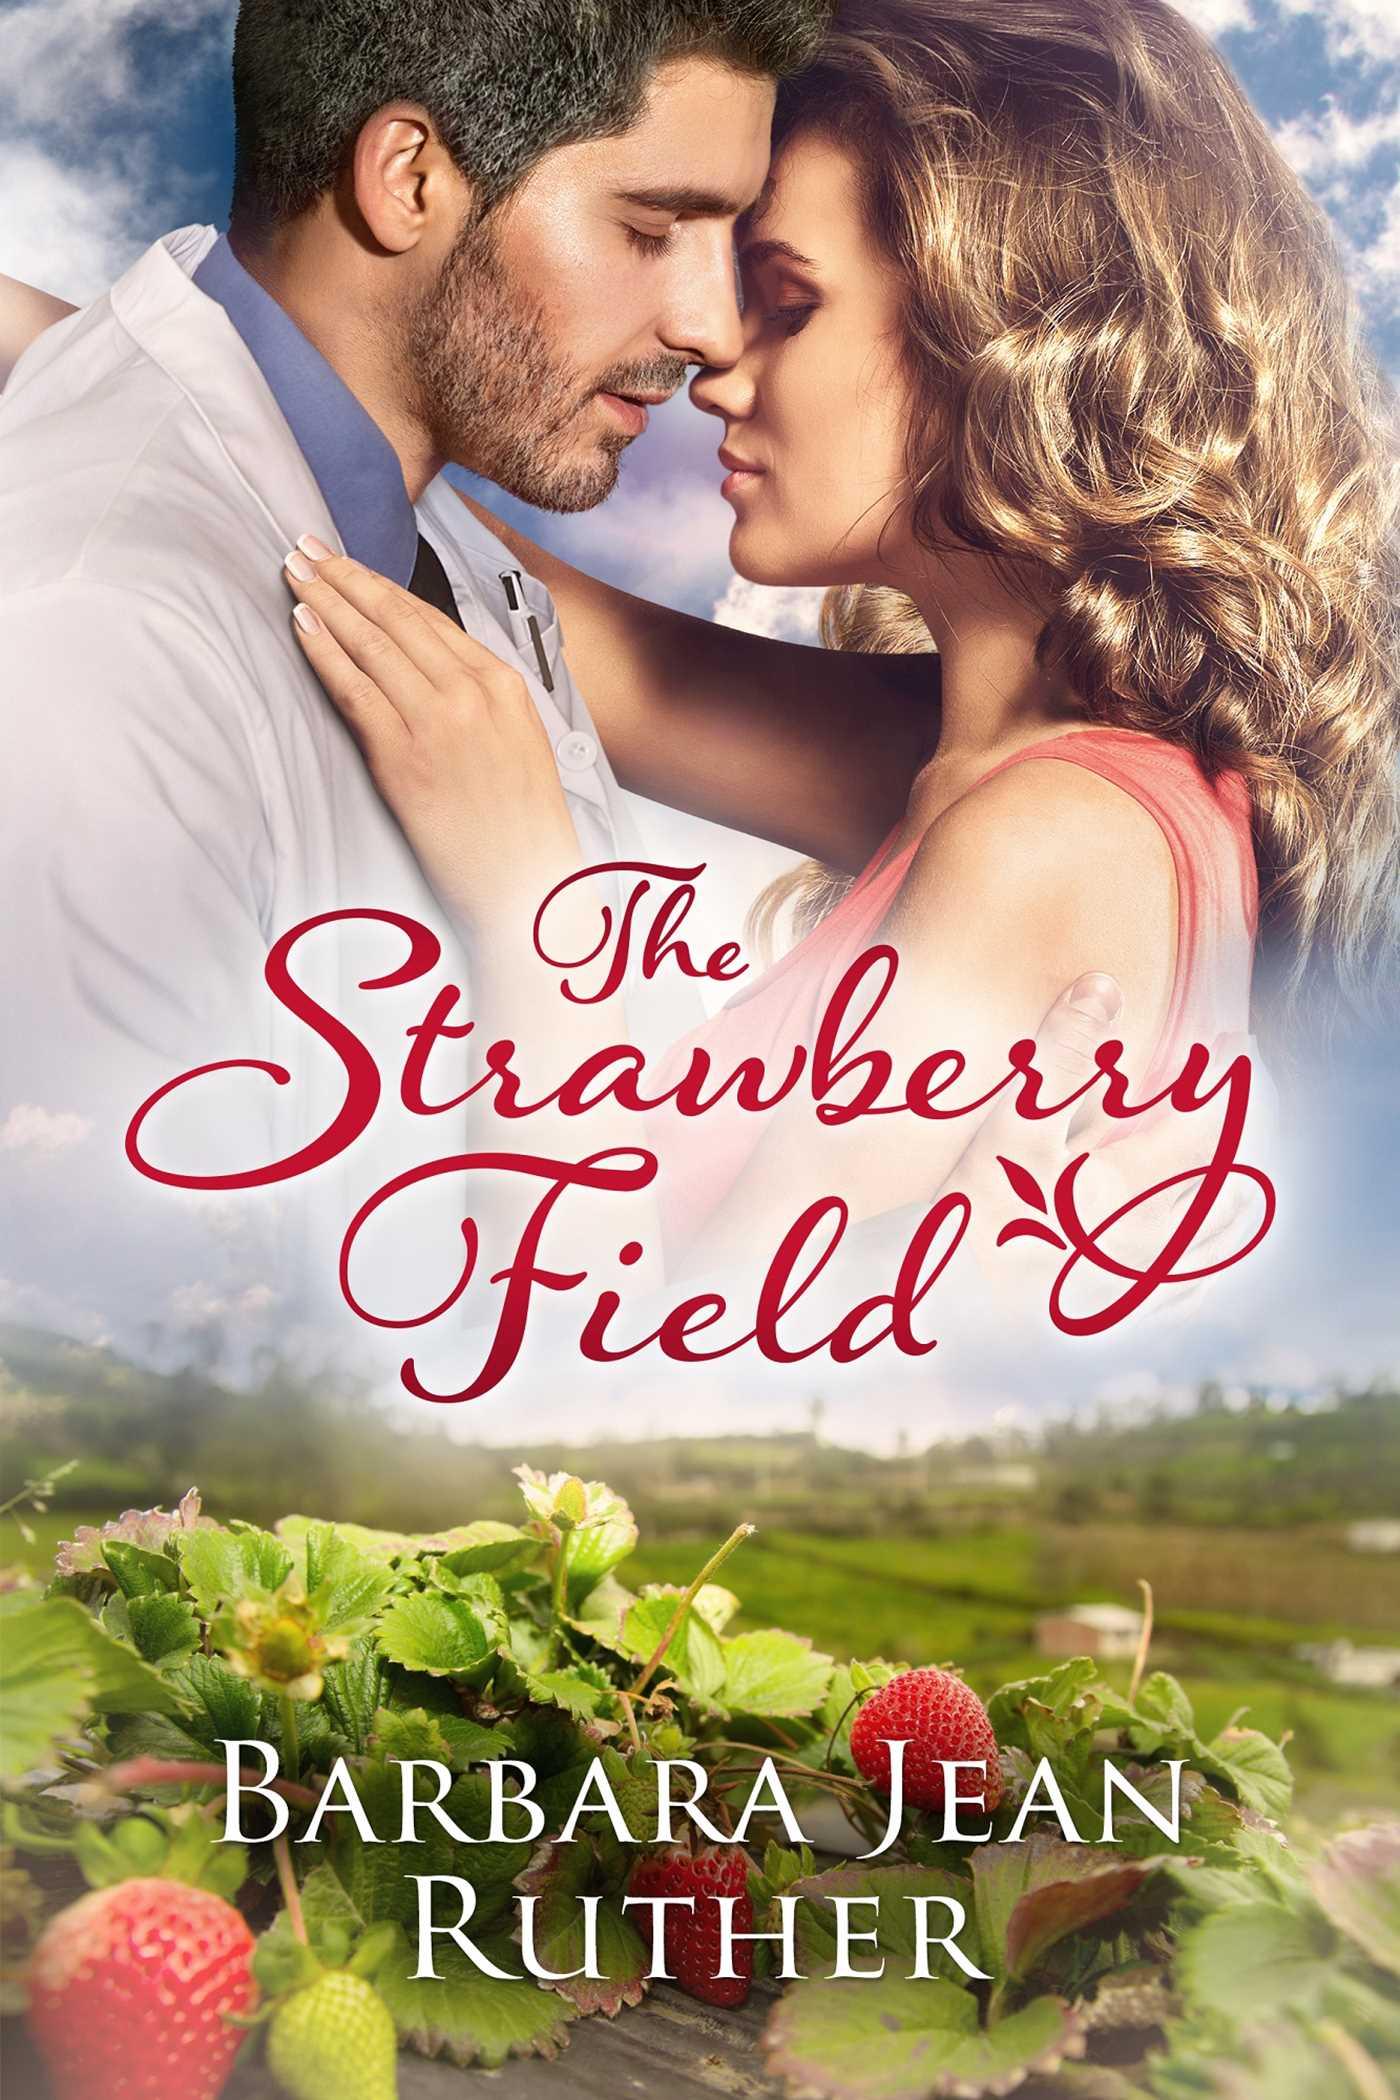 The strawberry field 9781682992135 hr